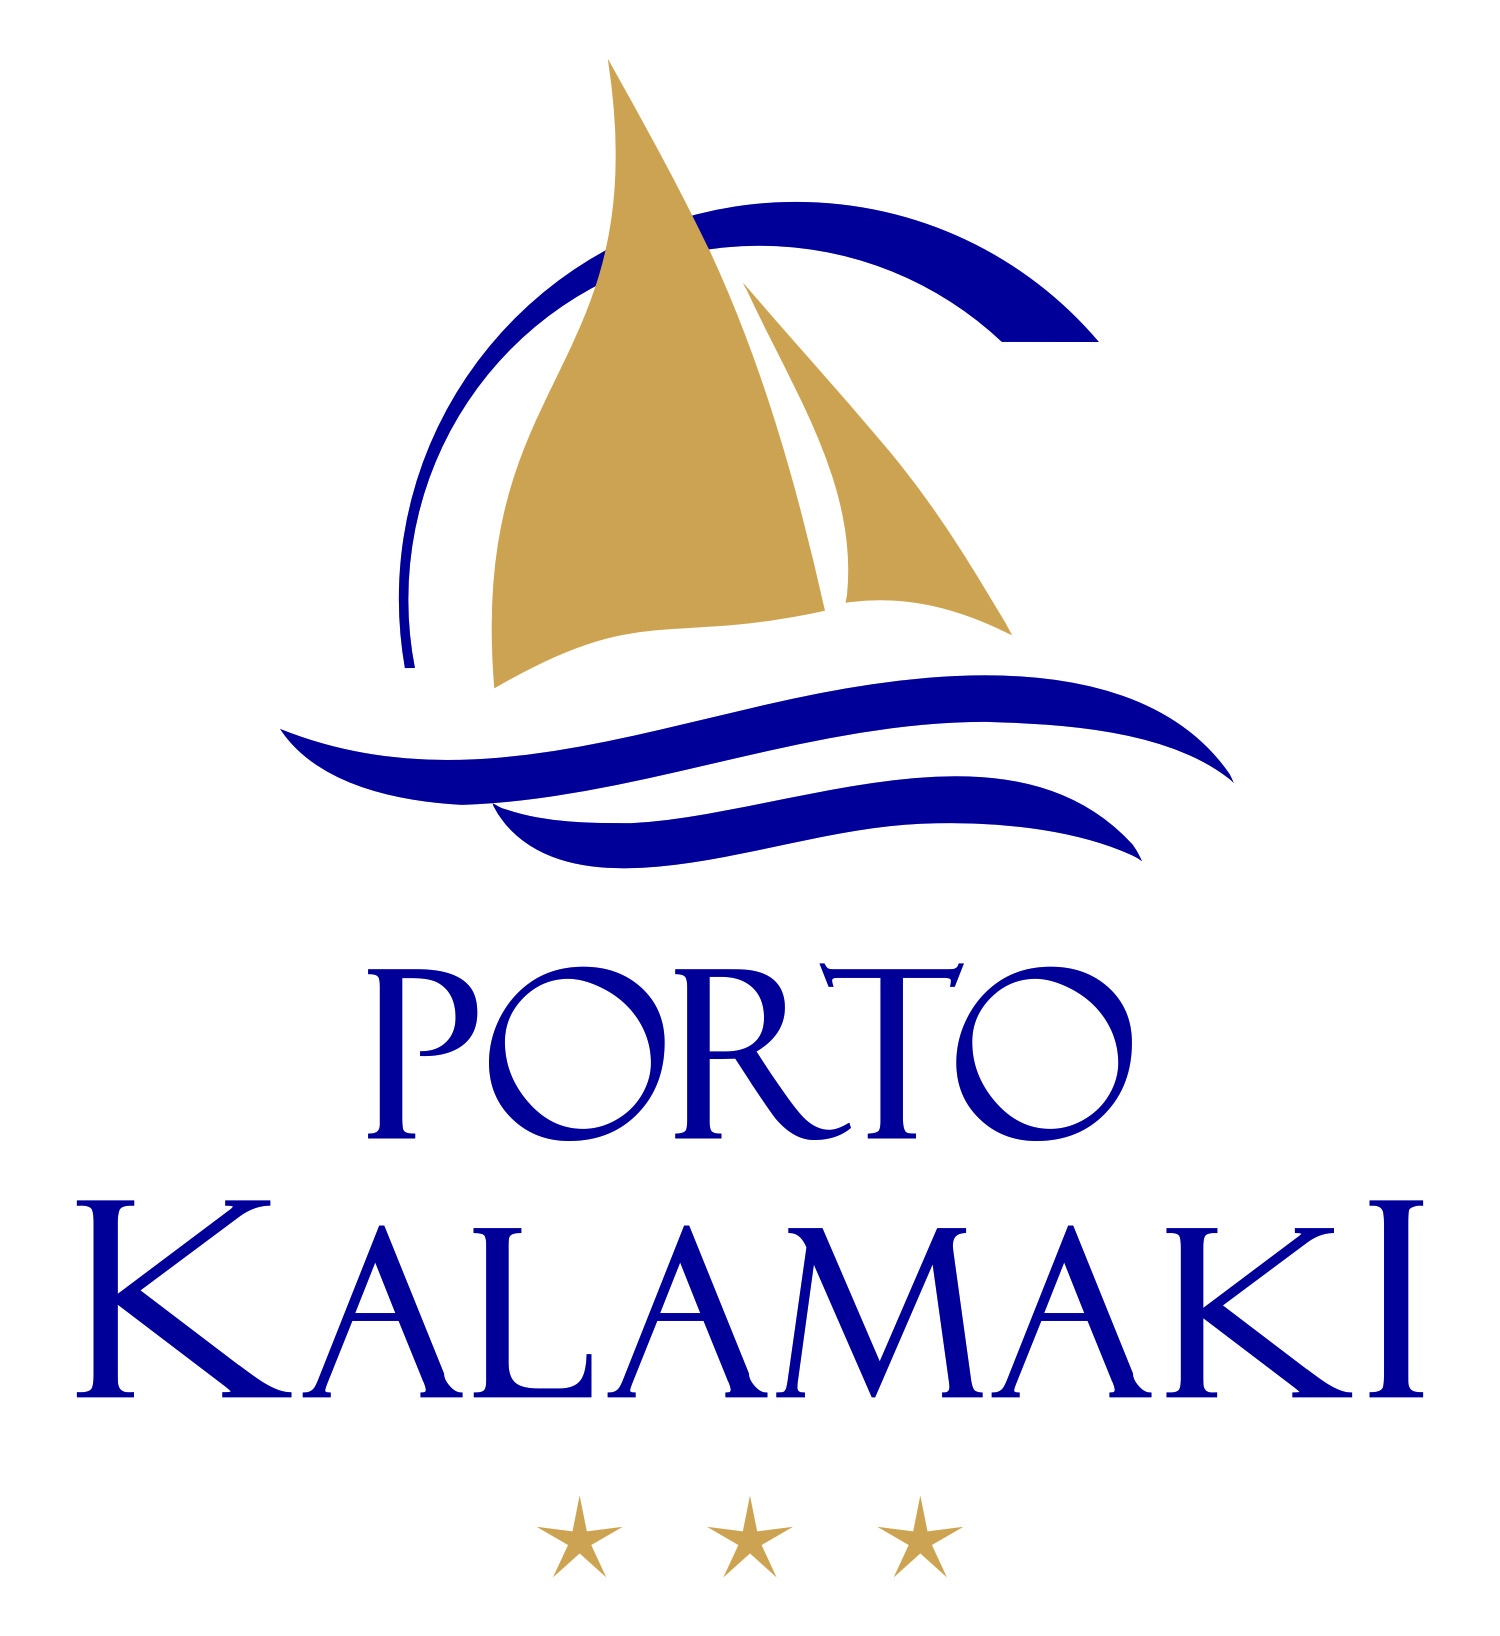 Porto Kalamaki